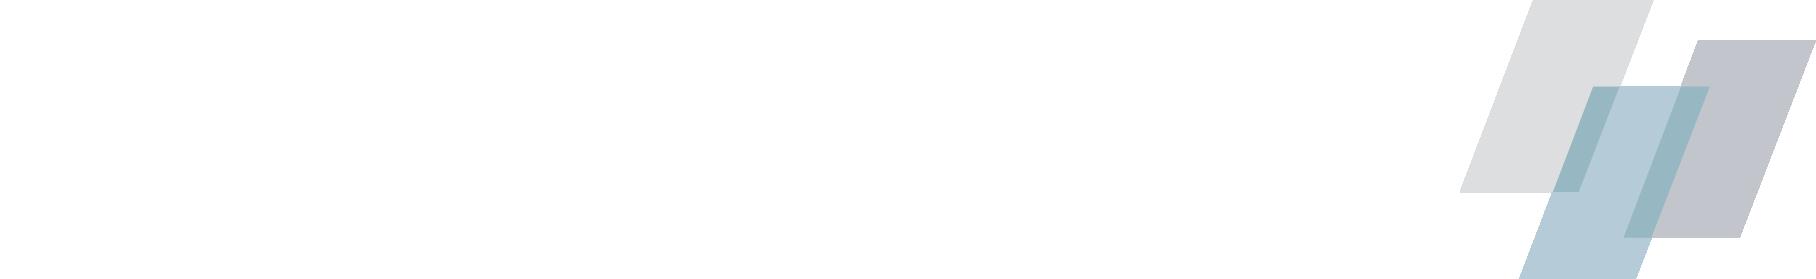 cybergym logo horizontal - white